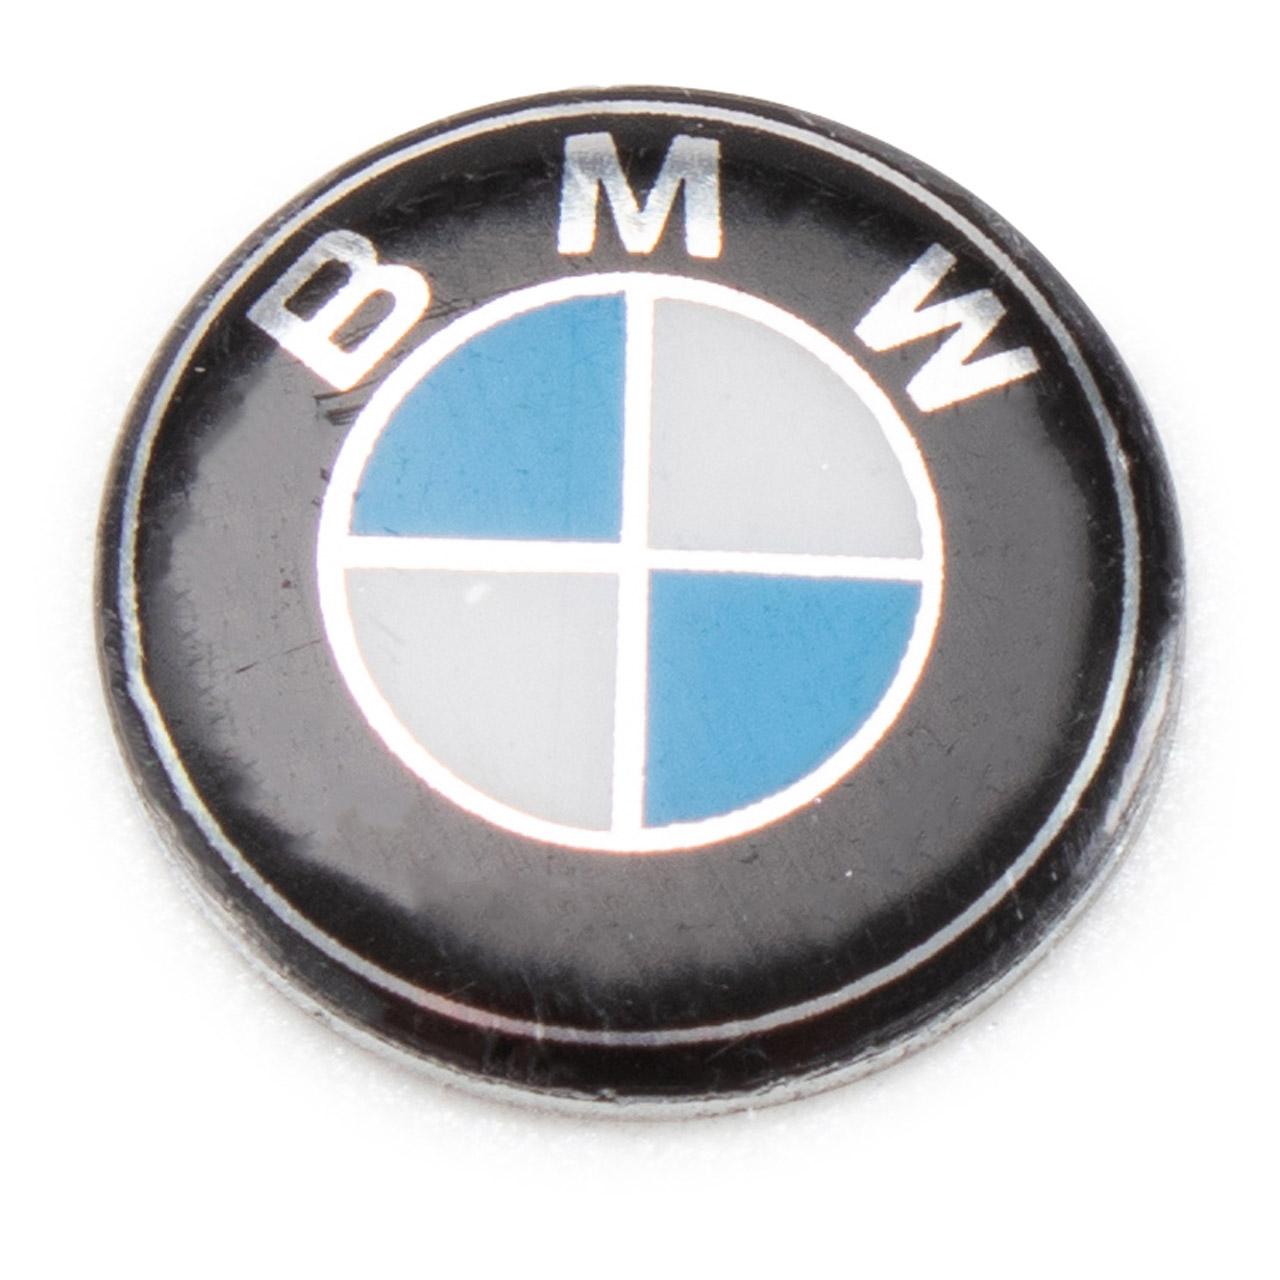 ORIGINAL BMW Schlüsselemblem Emblem Aufkleber für Schlüssel 11 mm 66122155754